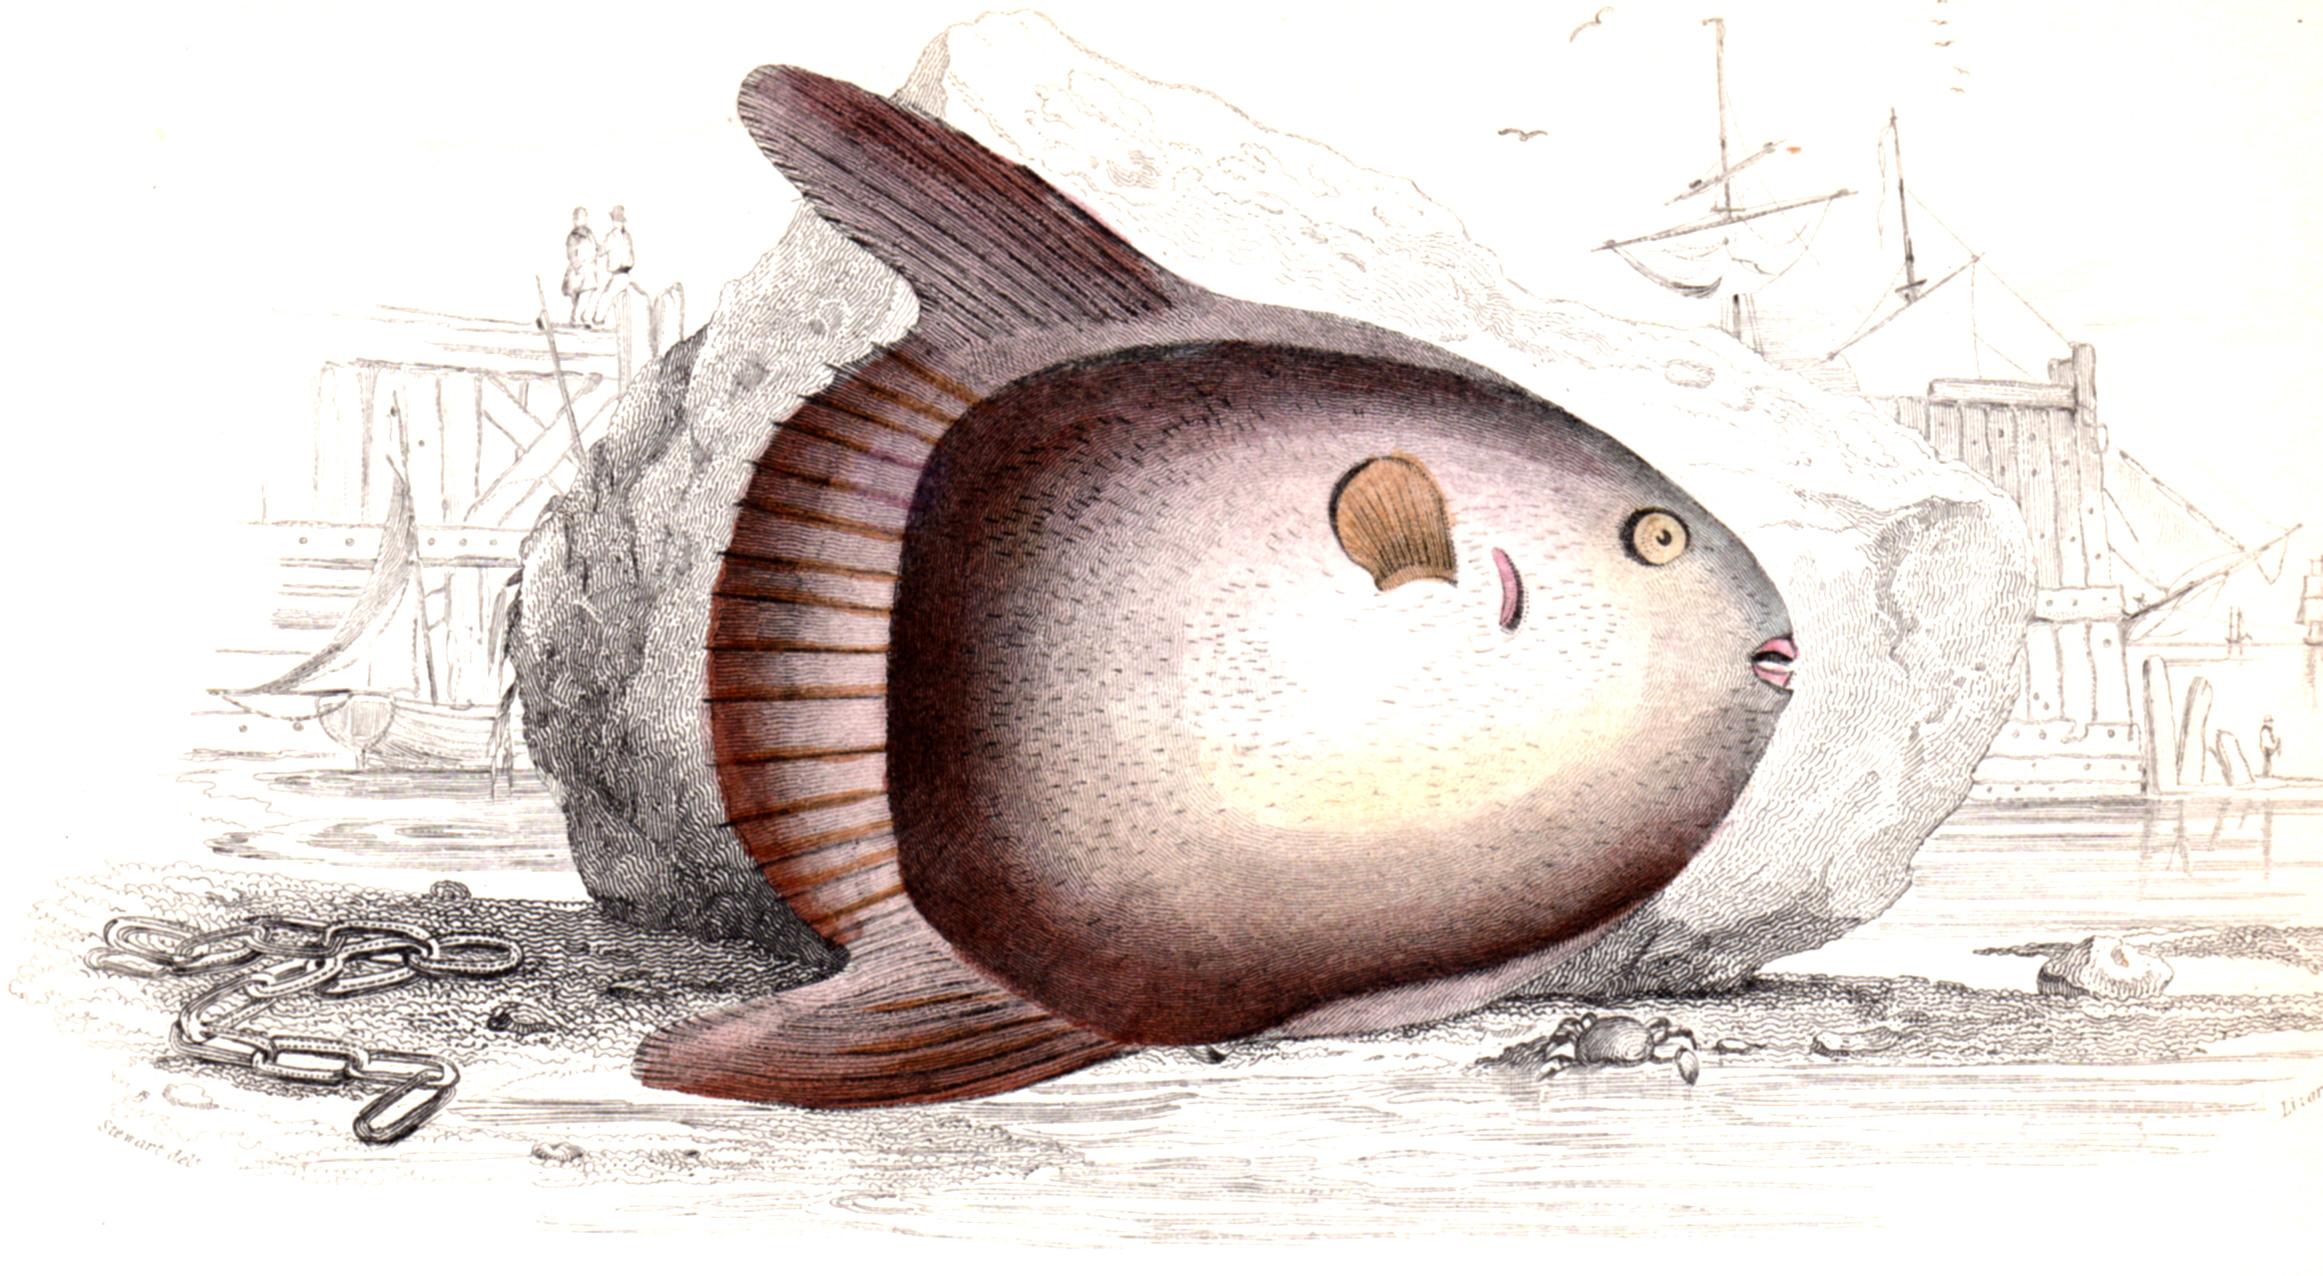 Jardine, Sir Wm / Lizars, Wm – Fish